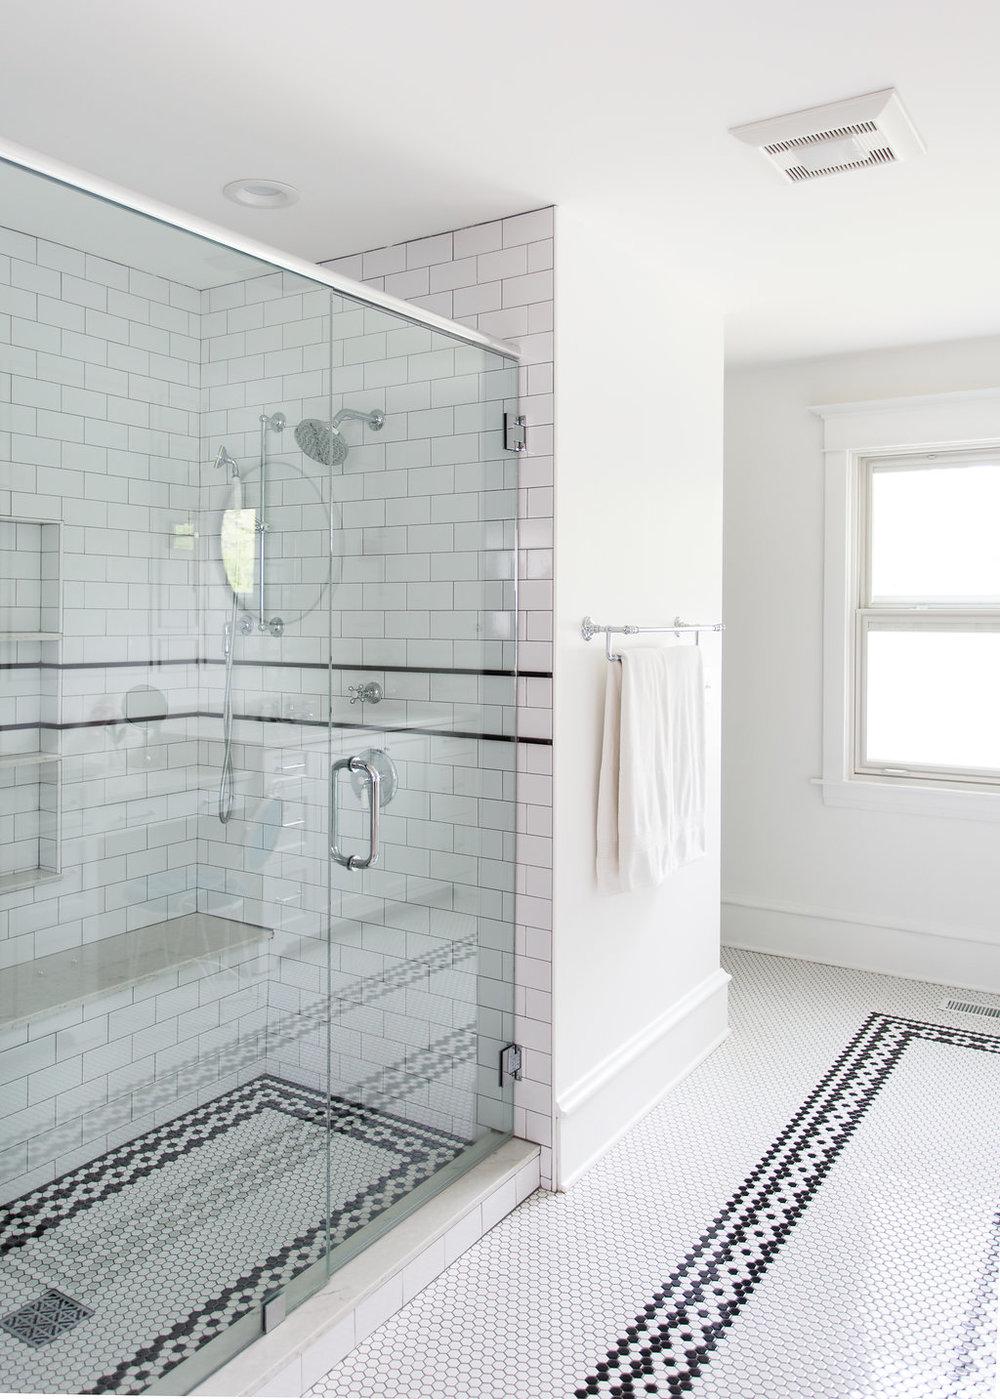 ember-cmr-bathroom-5021.jpg